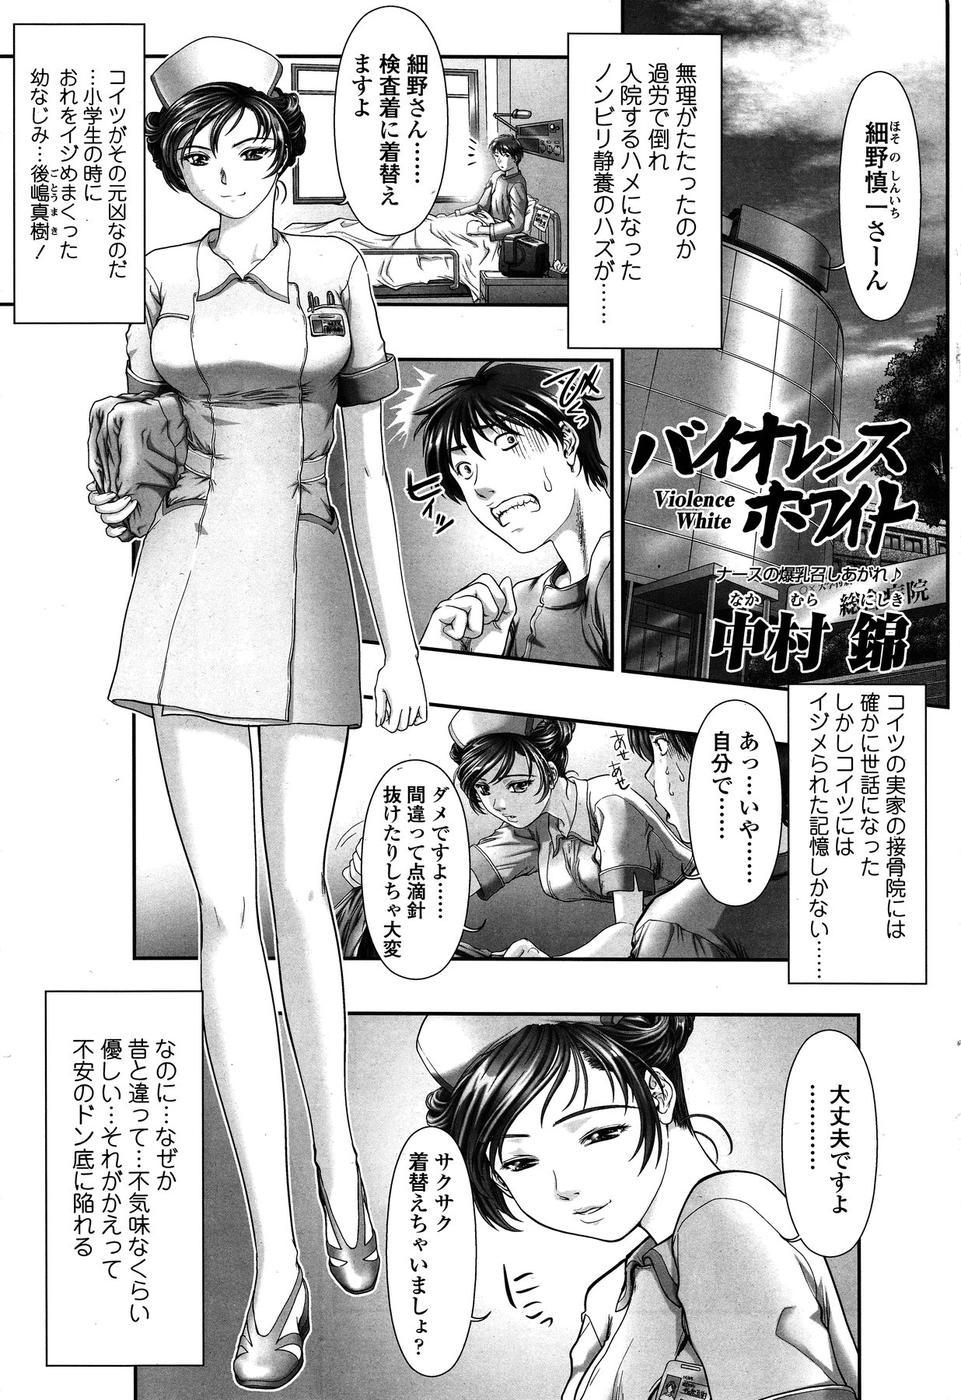 COMIC SIGMA 2009-01 Vol.28 21